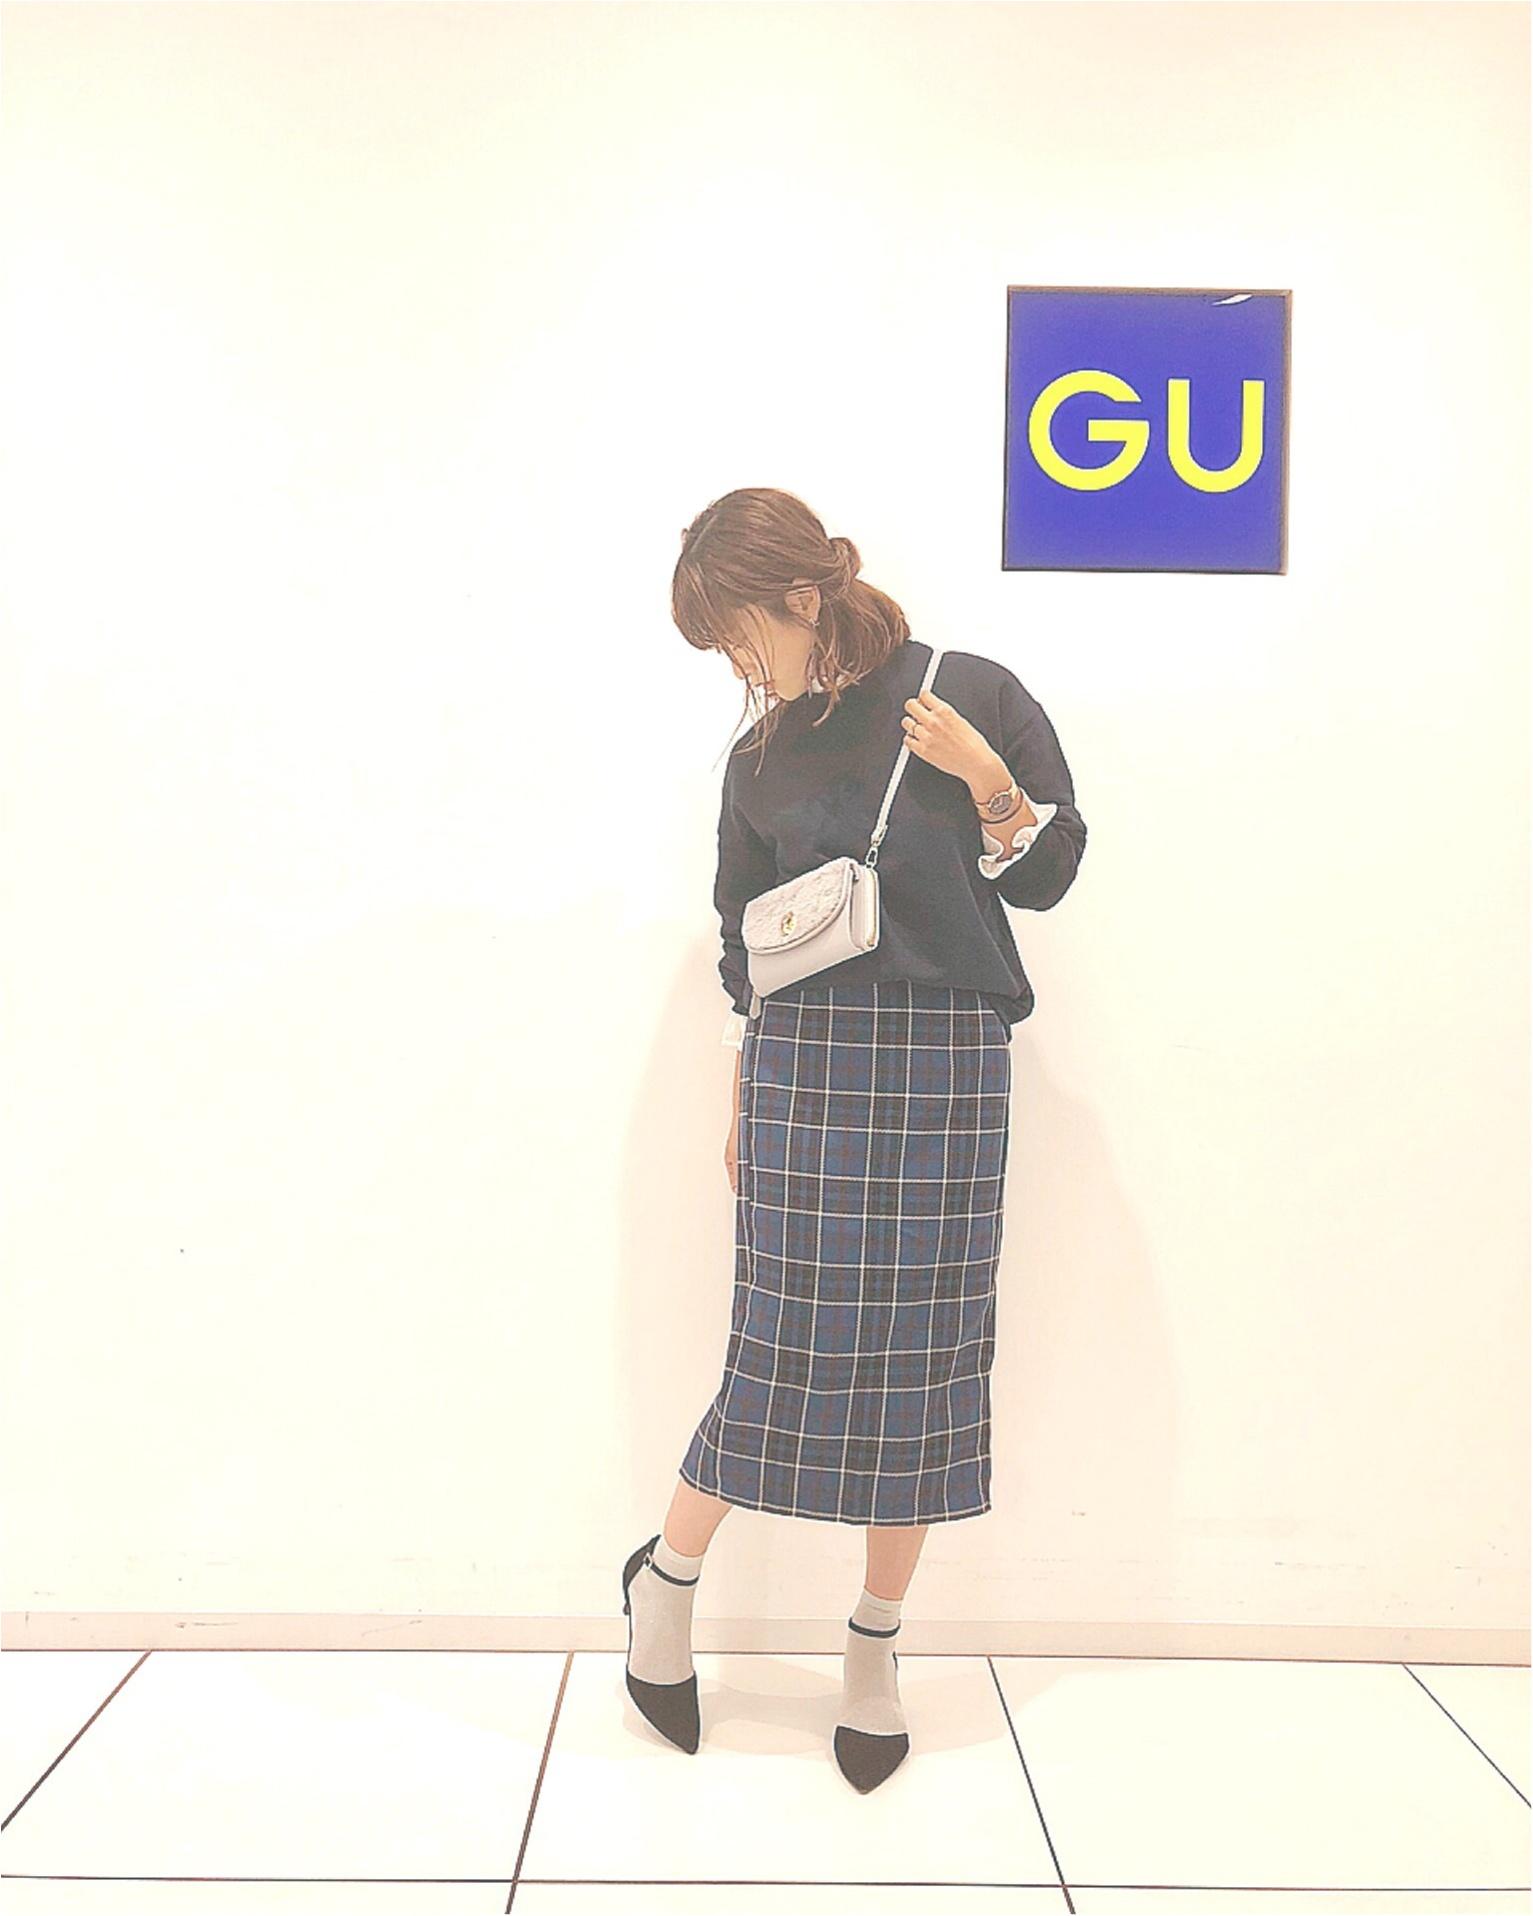 GU神マニアイベントに潜入!今季トレンド【スウェット】を着こなす3つのポイントとは❤️?_5